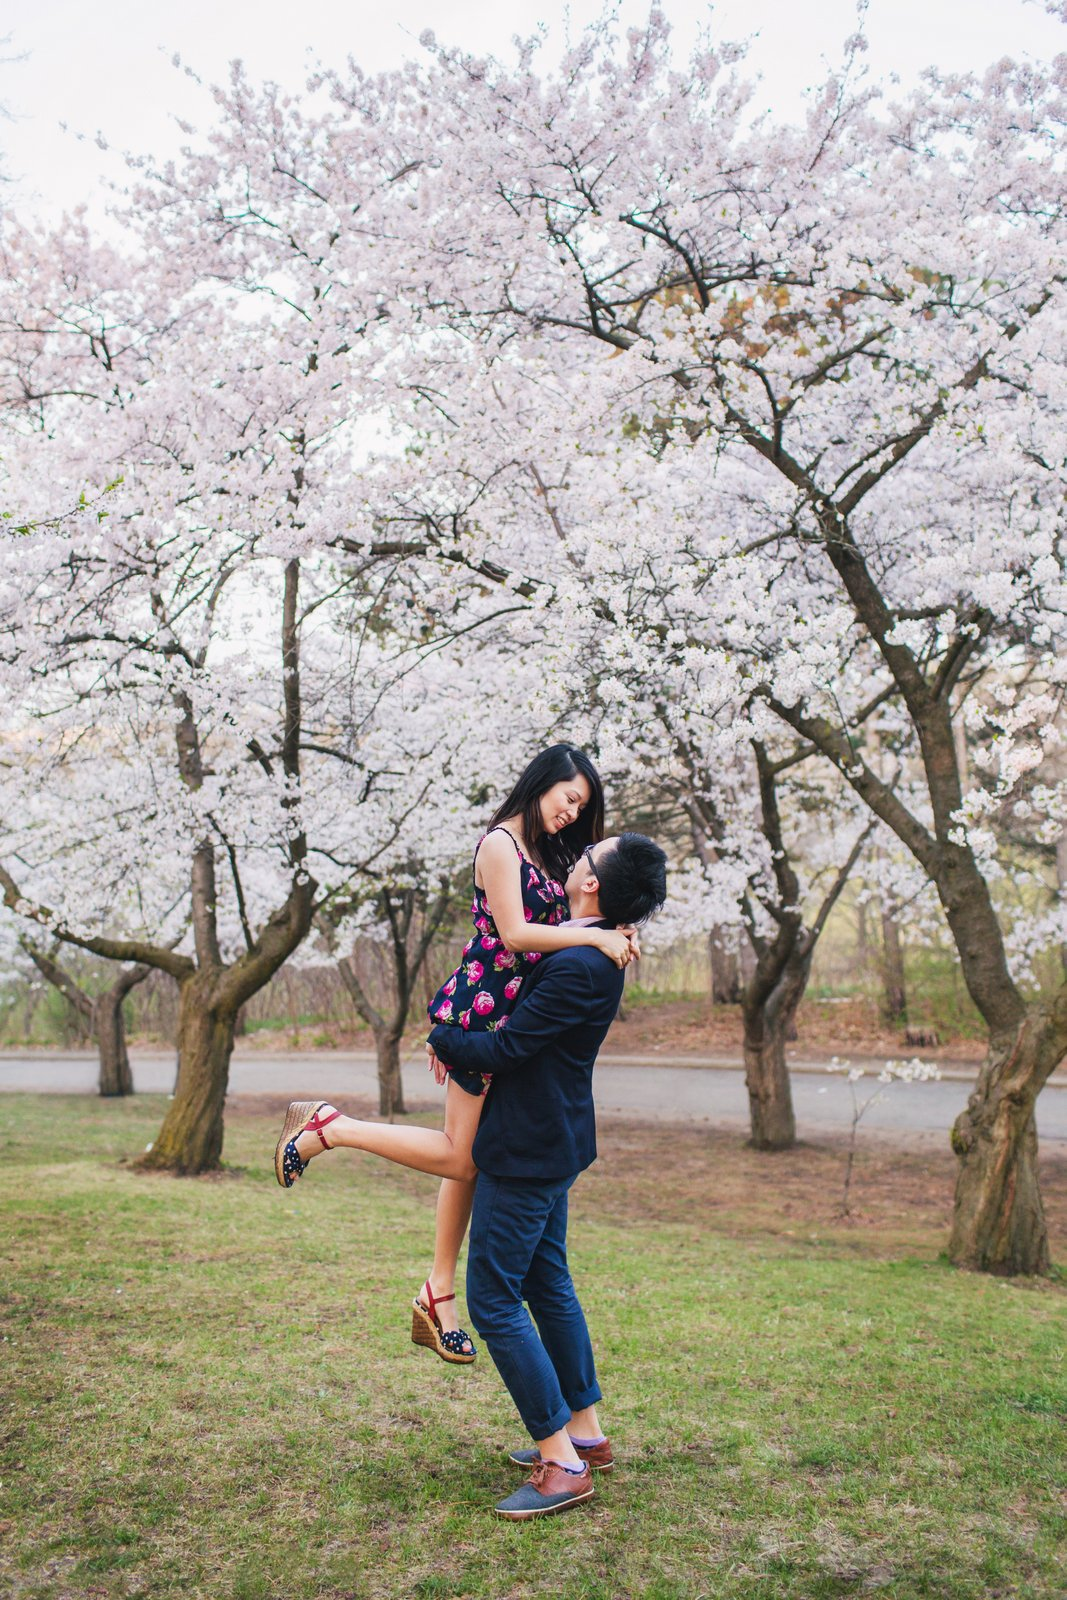 Jessica-Charles-Engagement-High-Park-Cherry-Blossom-011